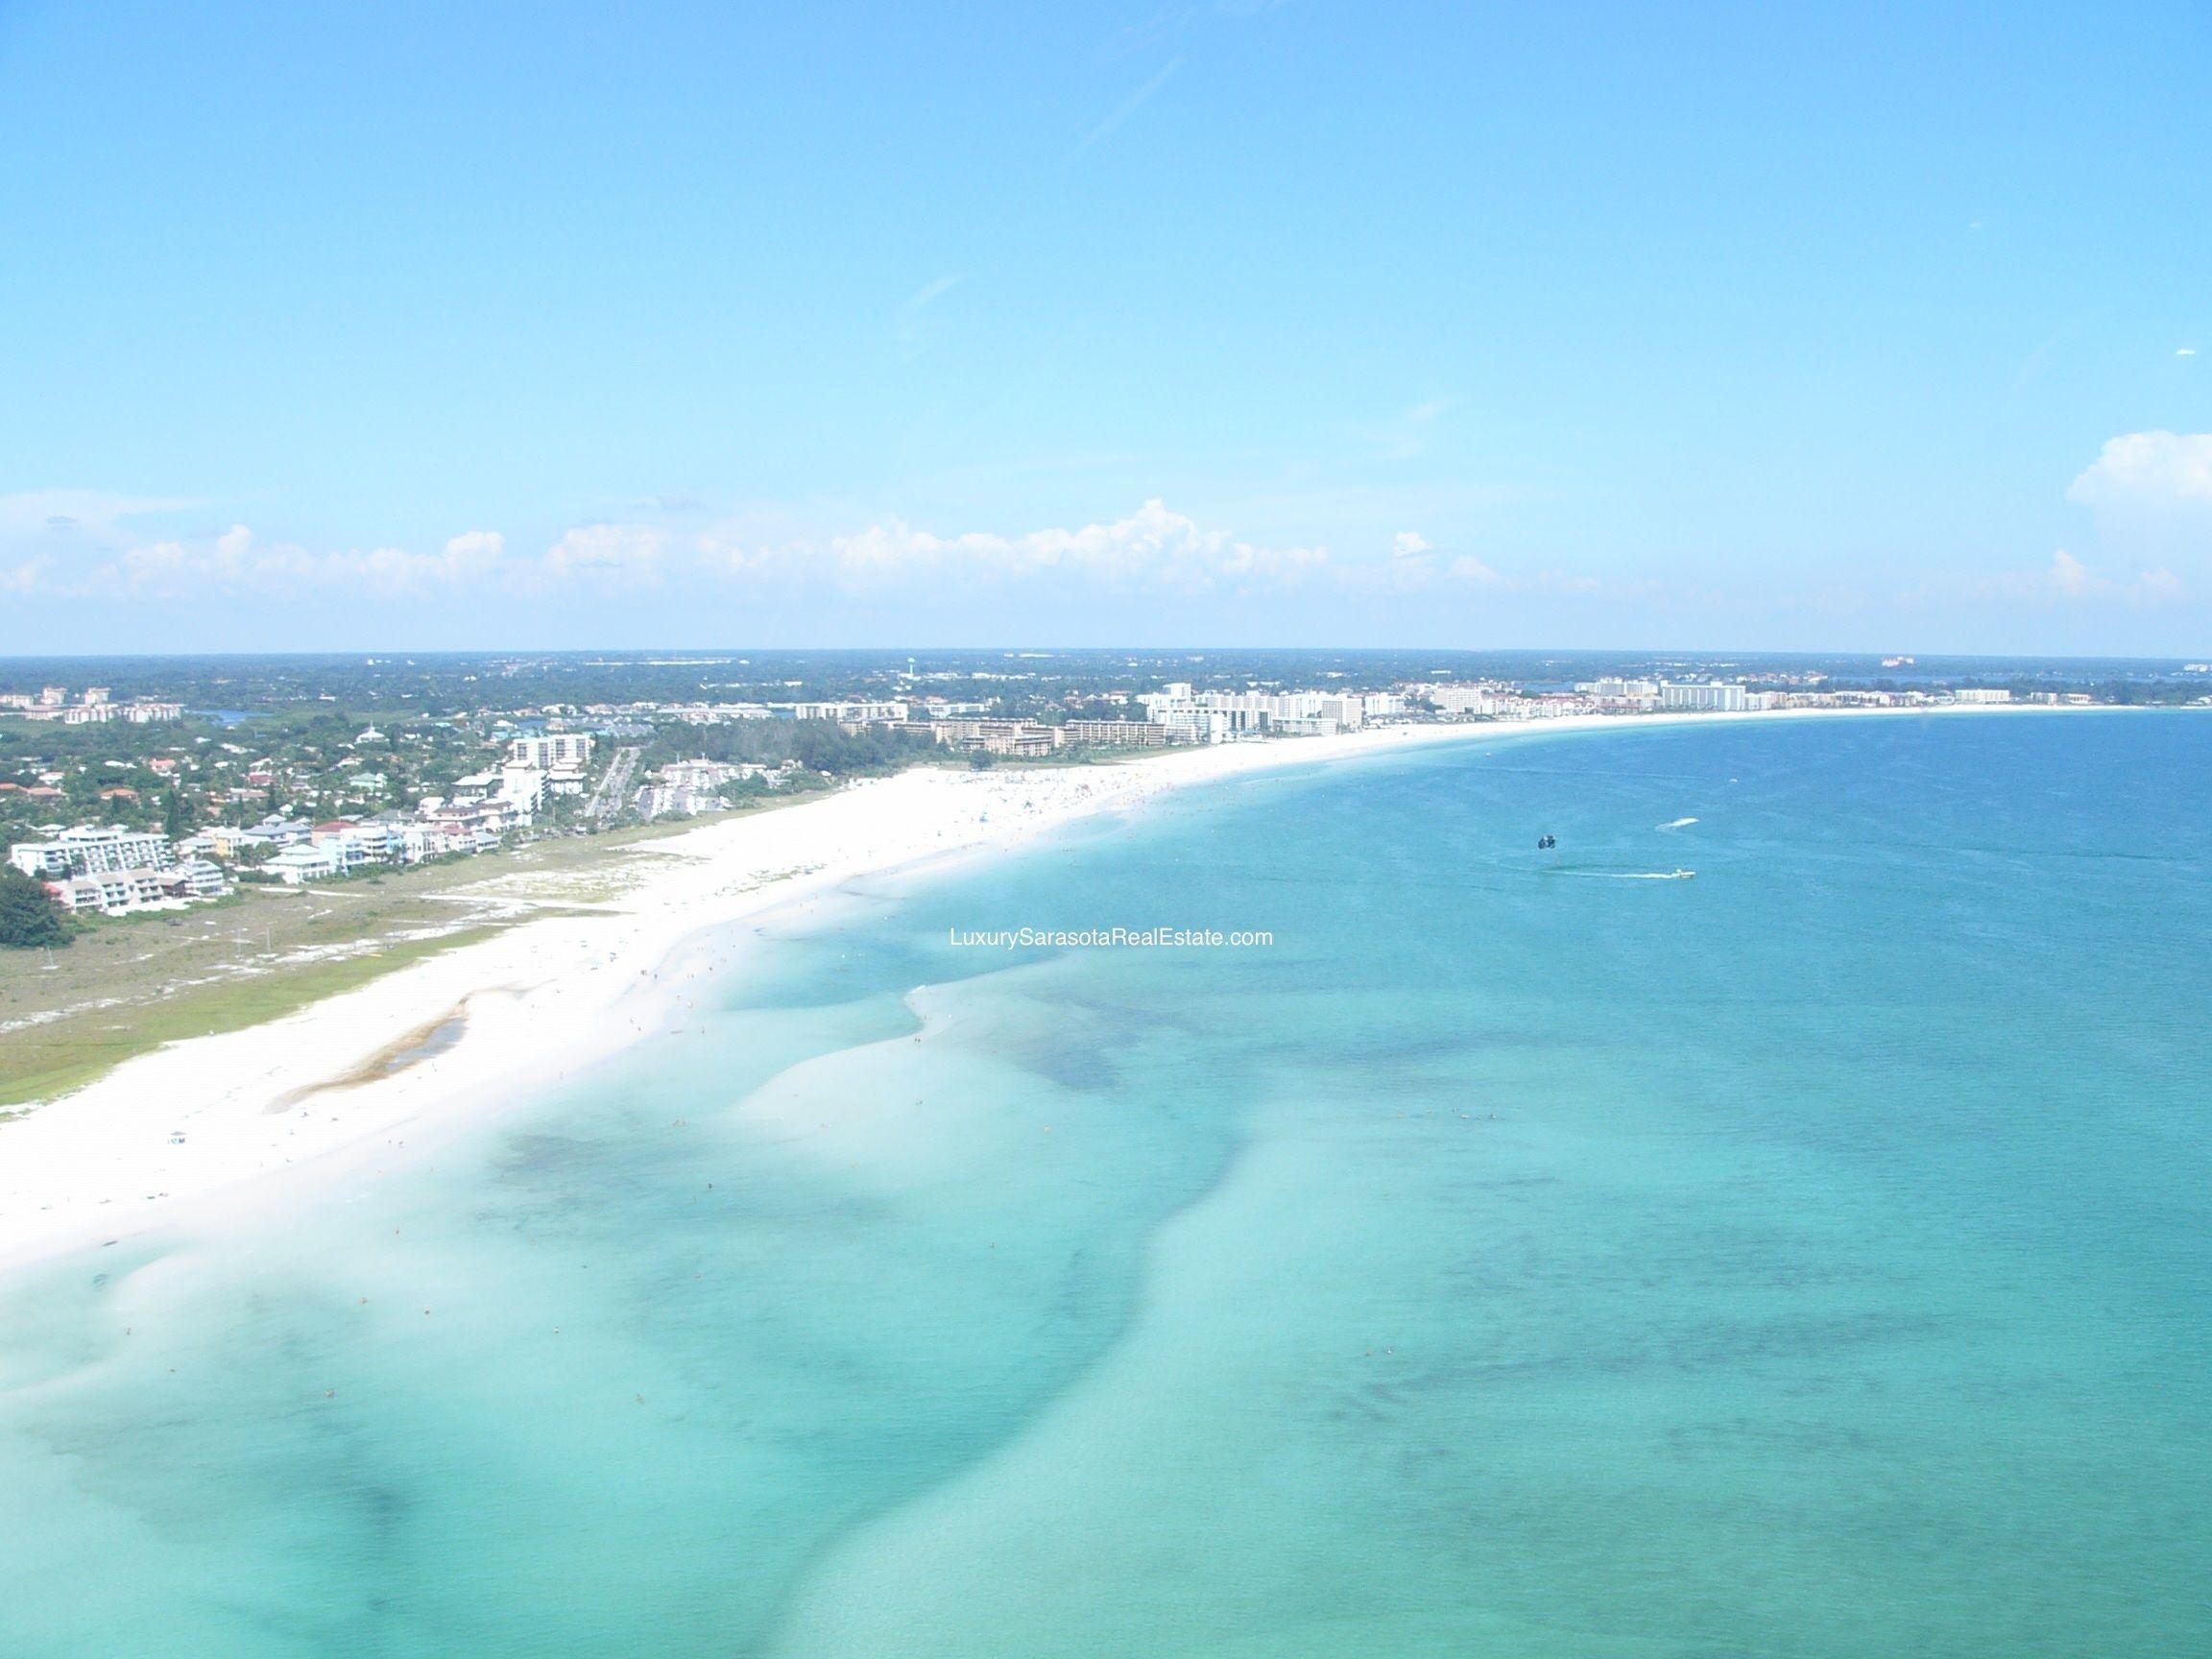 Sarasota beaches - Siesta Beach Dead Sea Http Issuu Com Deddy3 Docs